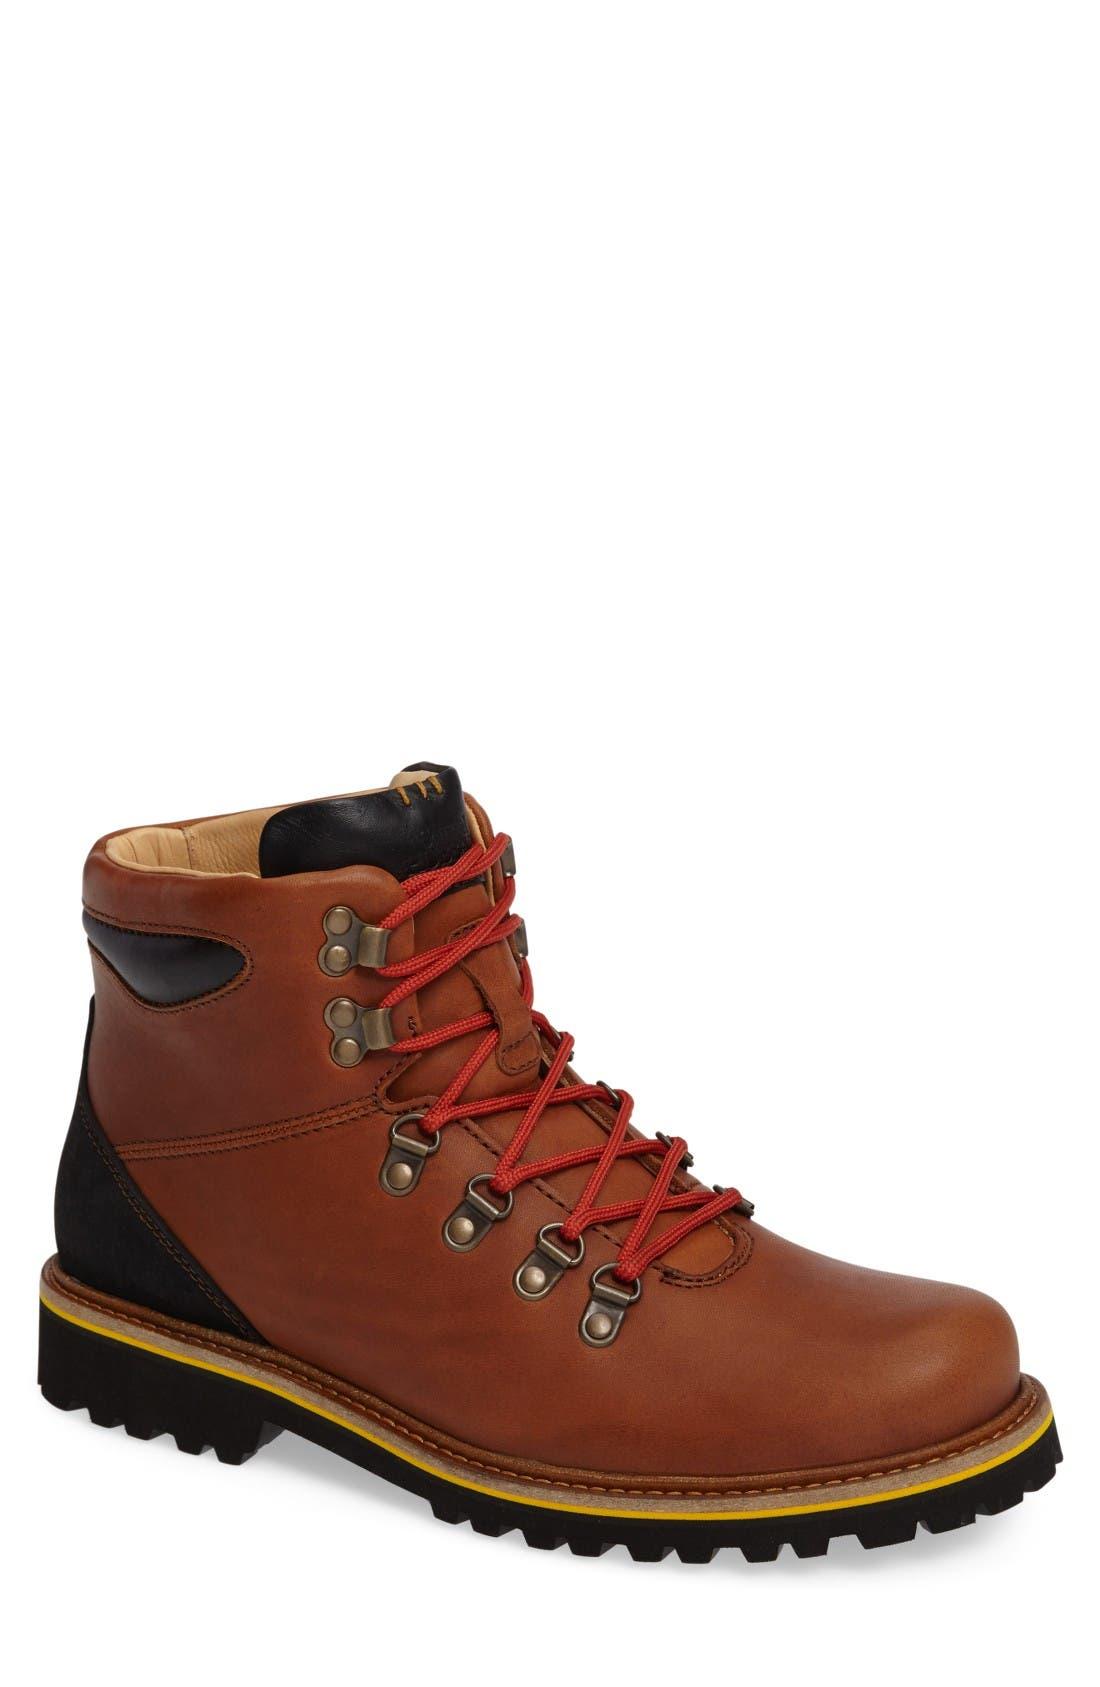 Mt. Tam Hiking Boot,                             Main thumbnail 1, color,                             Saddlebag Tan Leather